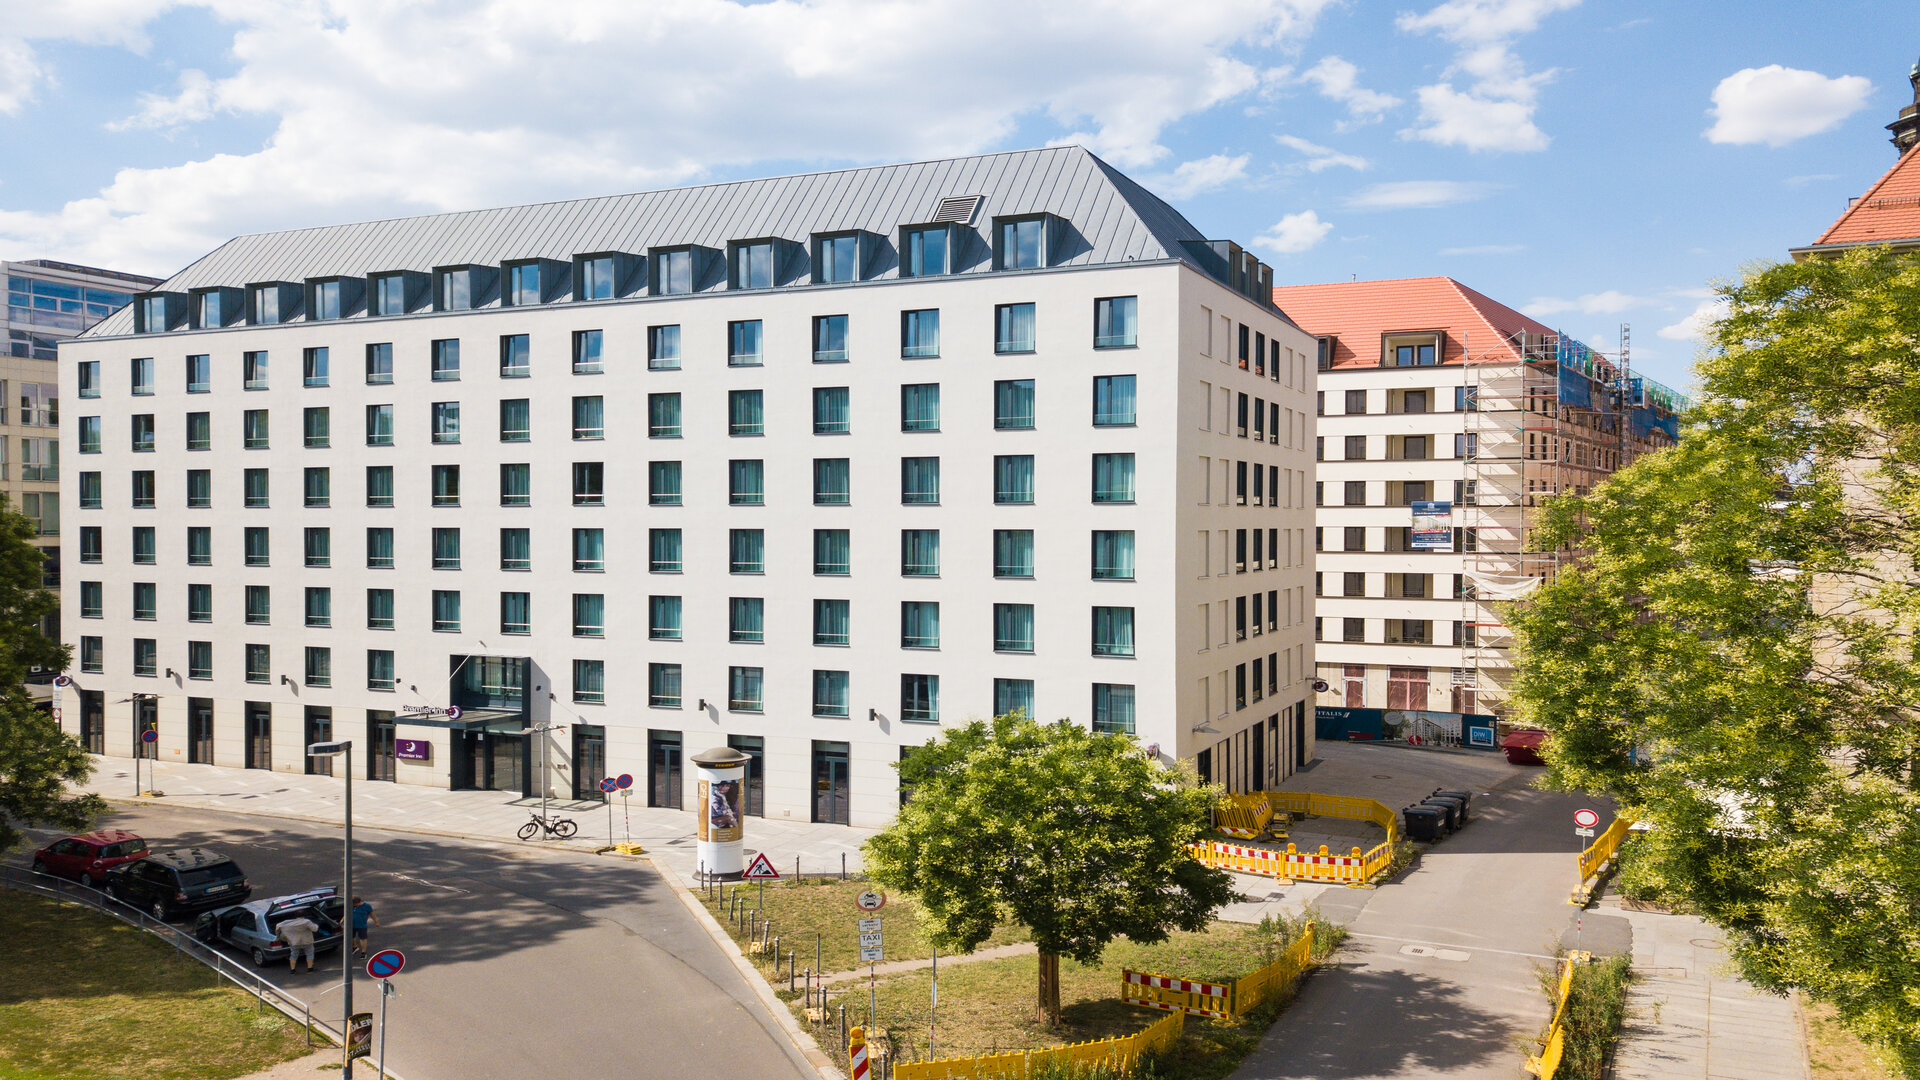 Premier Inn Hotel Dresden City (Zentrum)